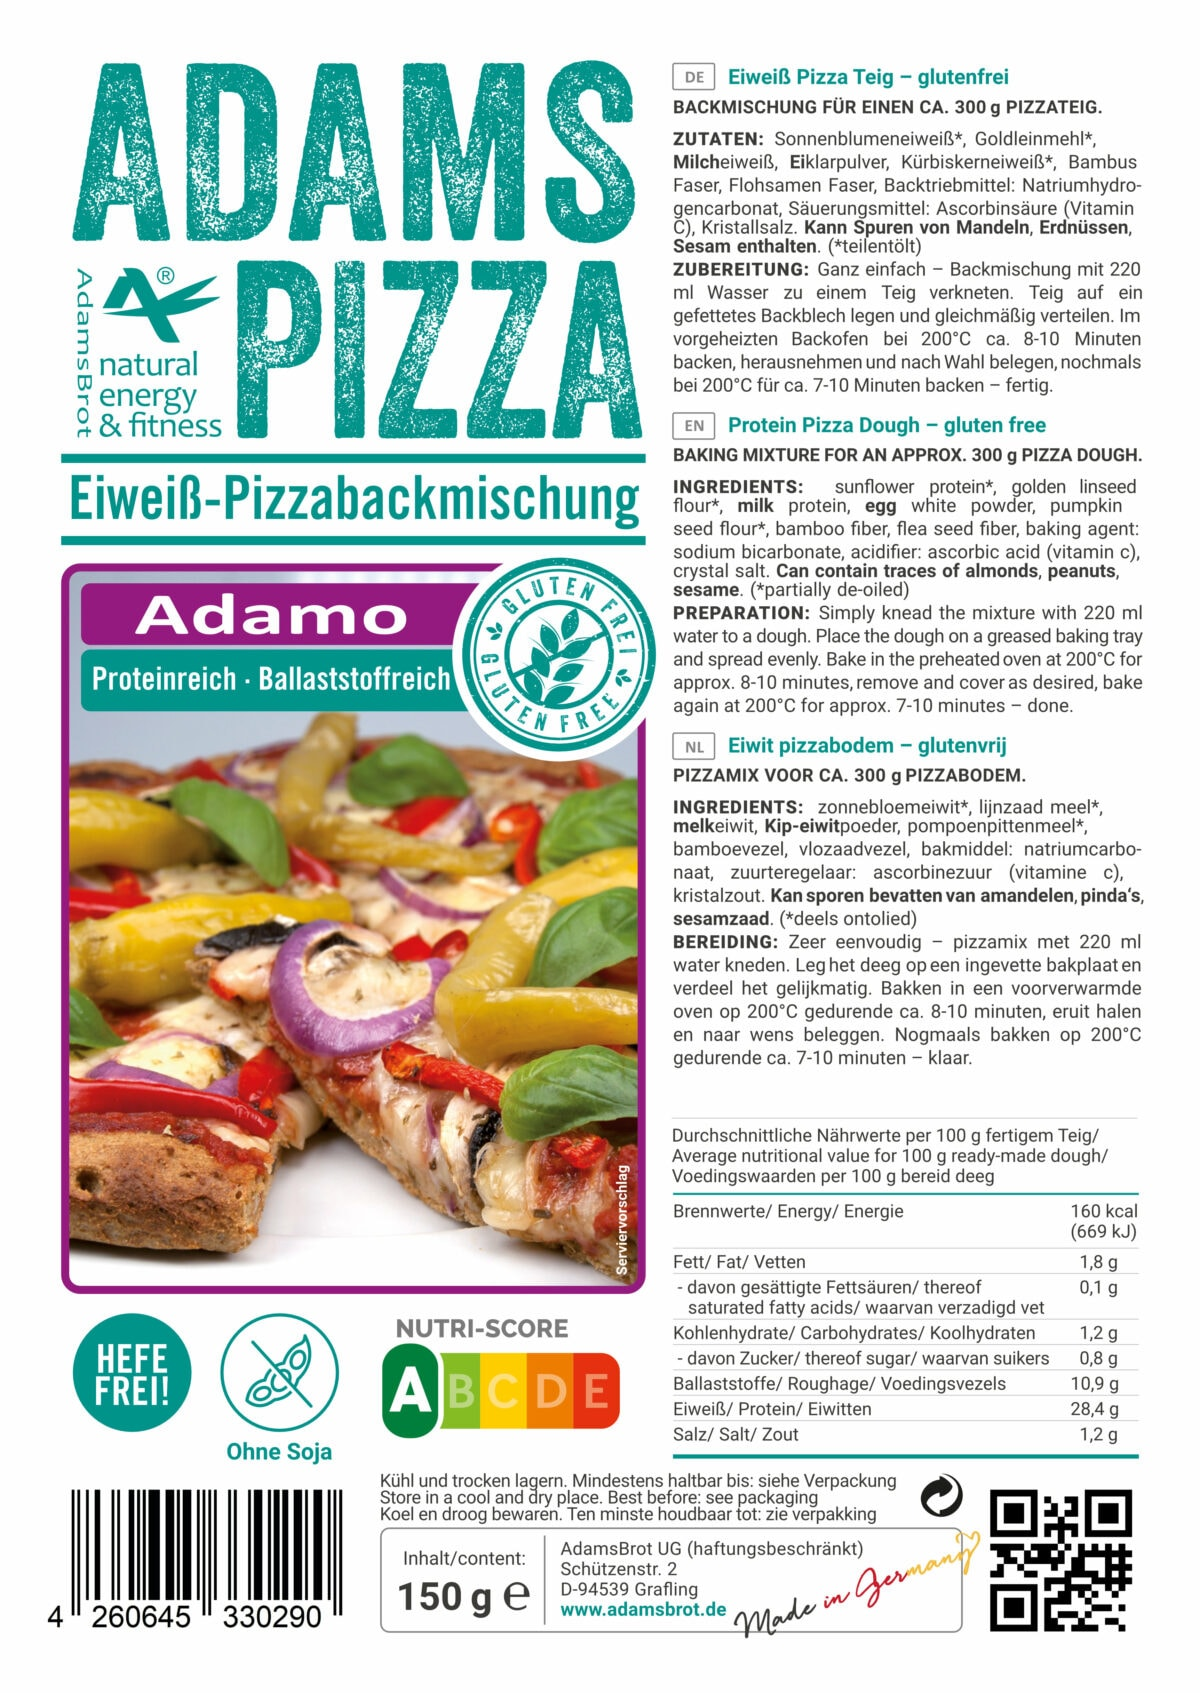 Preparato per pizza low carb Adams Brot.jpg